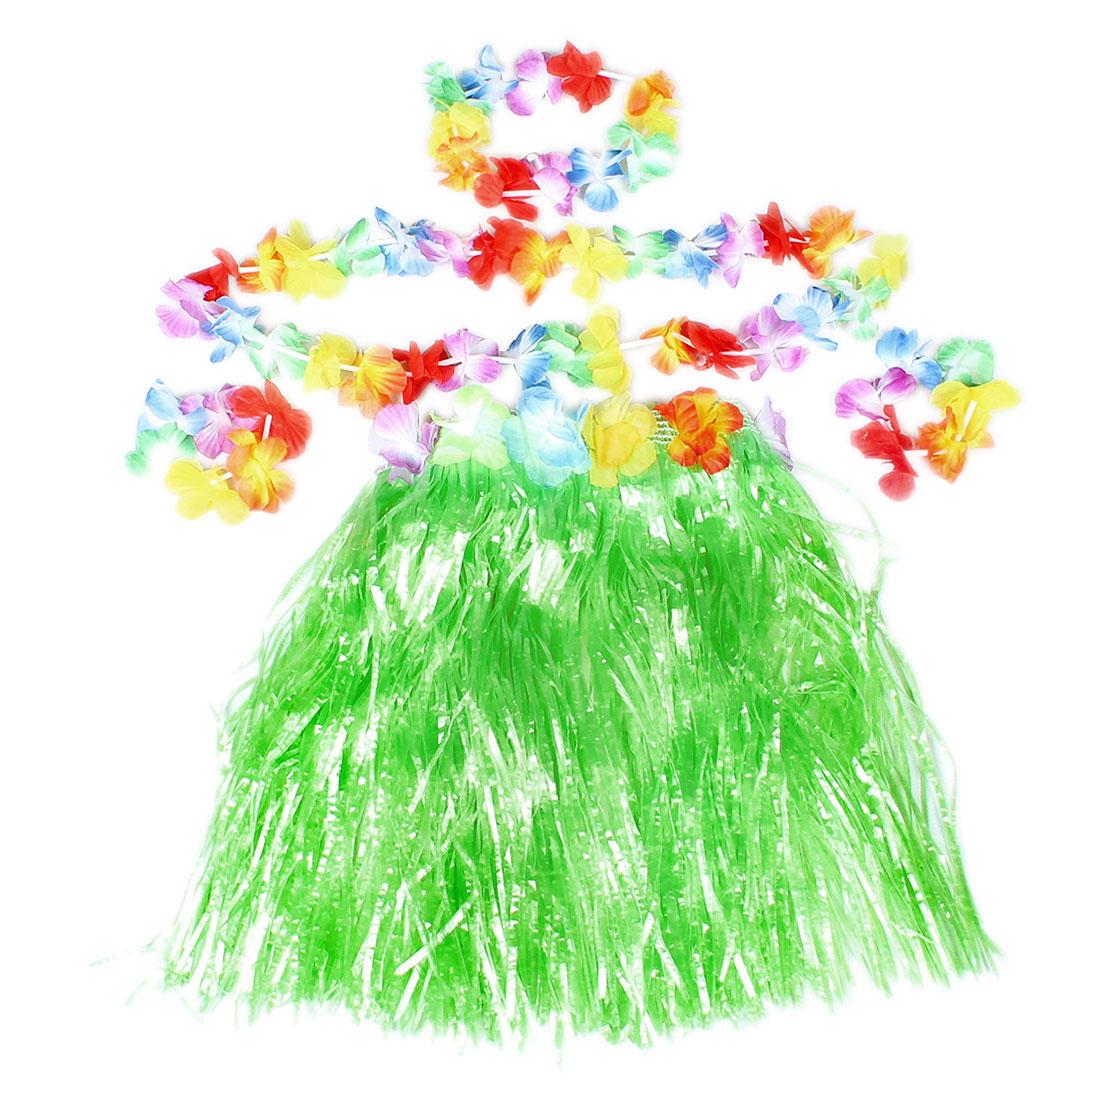 Colorful Flowers Decor Halloween Hawaiian Hula Grass Skirt Green for